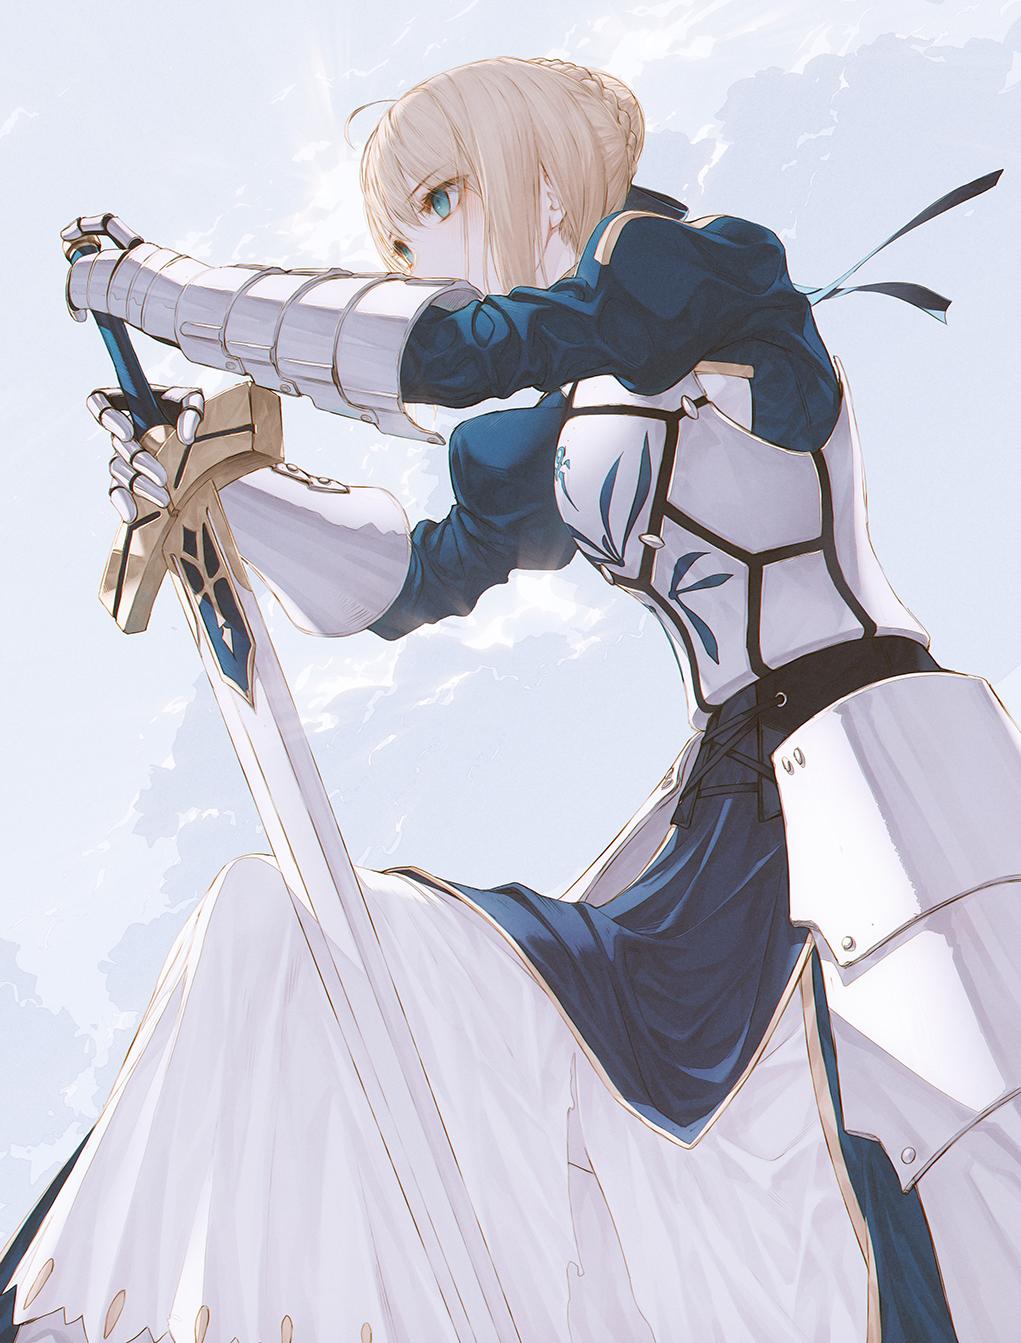 Anime 1021x1343 Fate Series Fate/Stay Night anime girls blond hair Saber Arturia Pendragon wanke